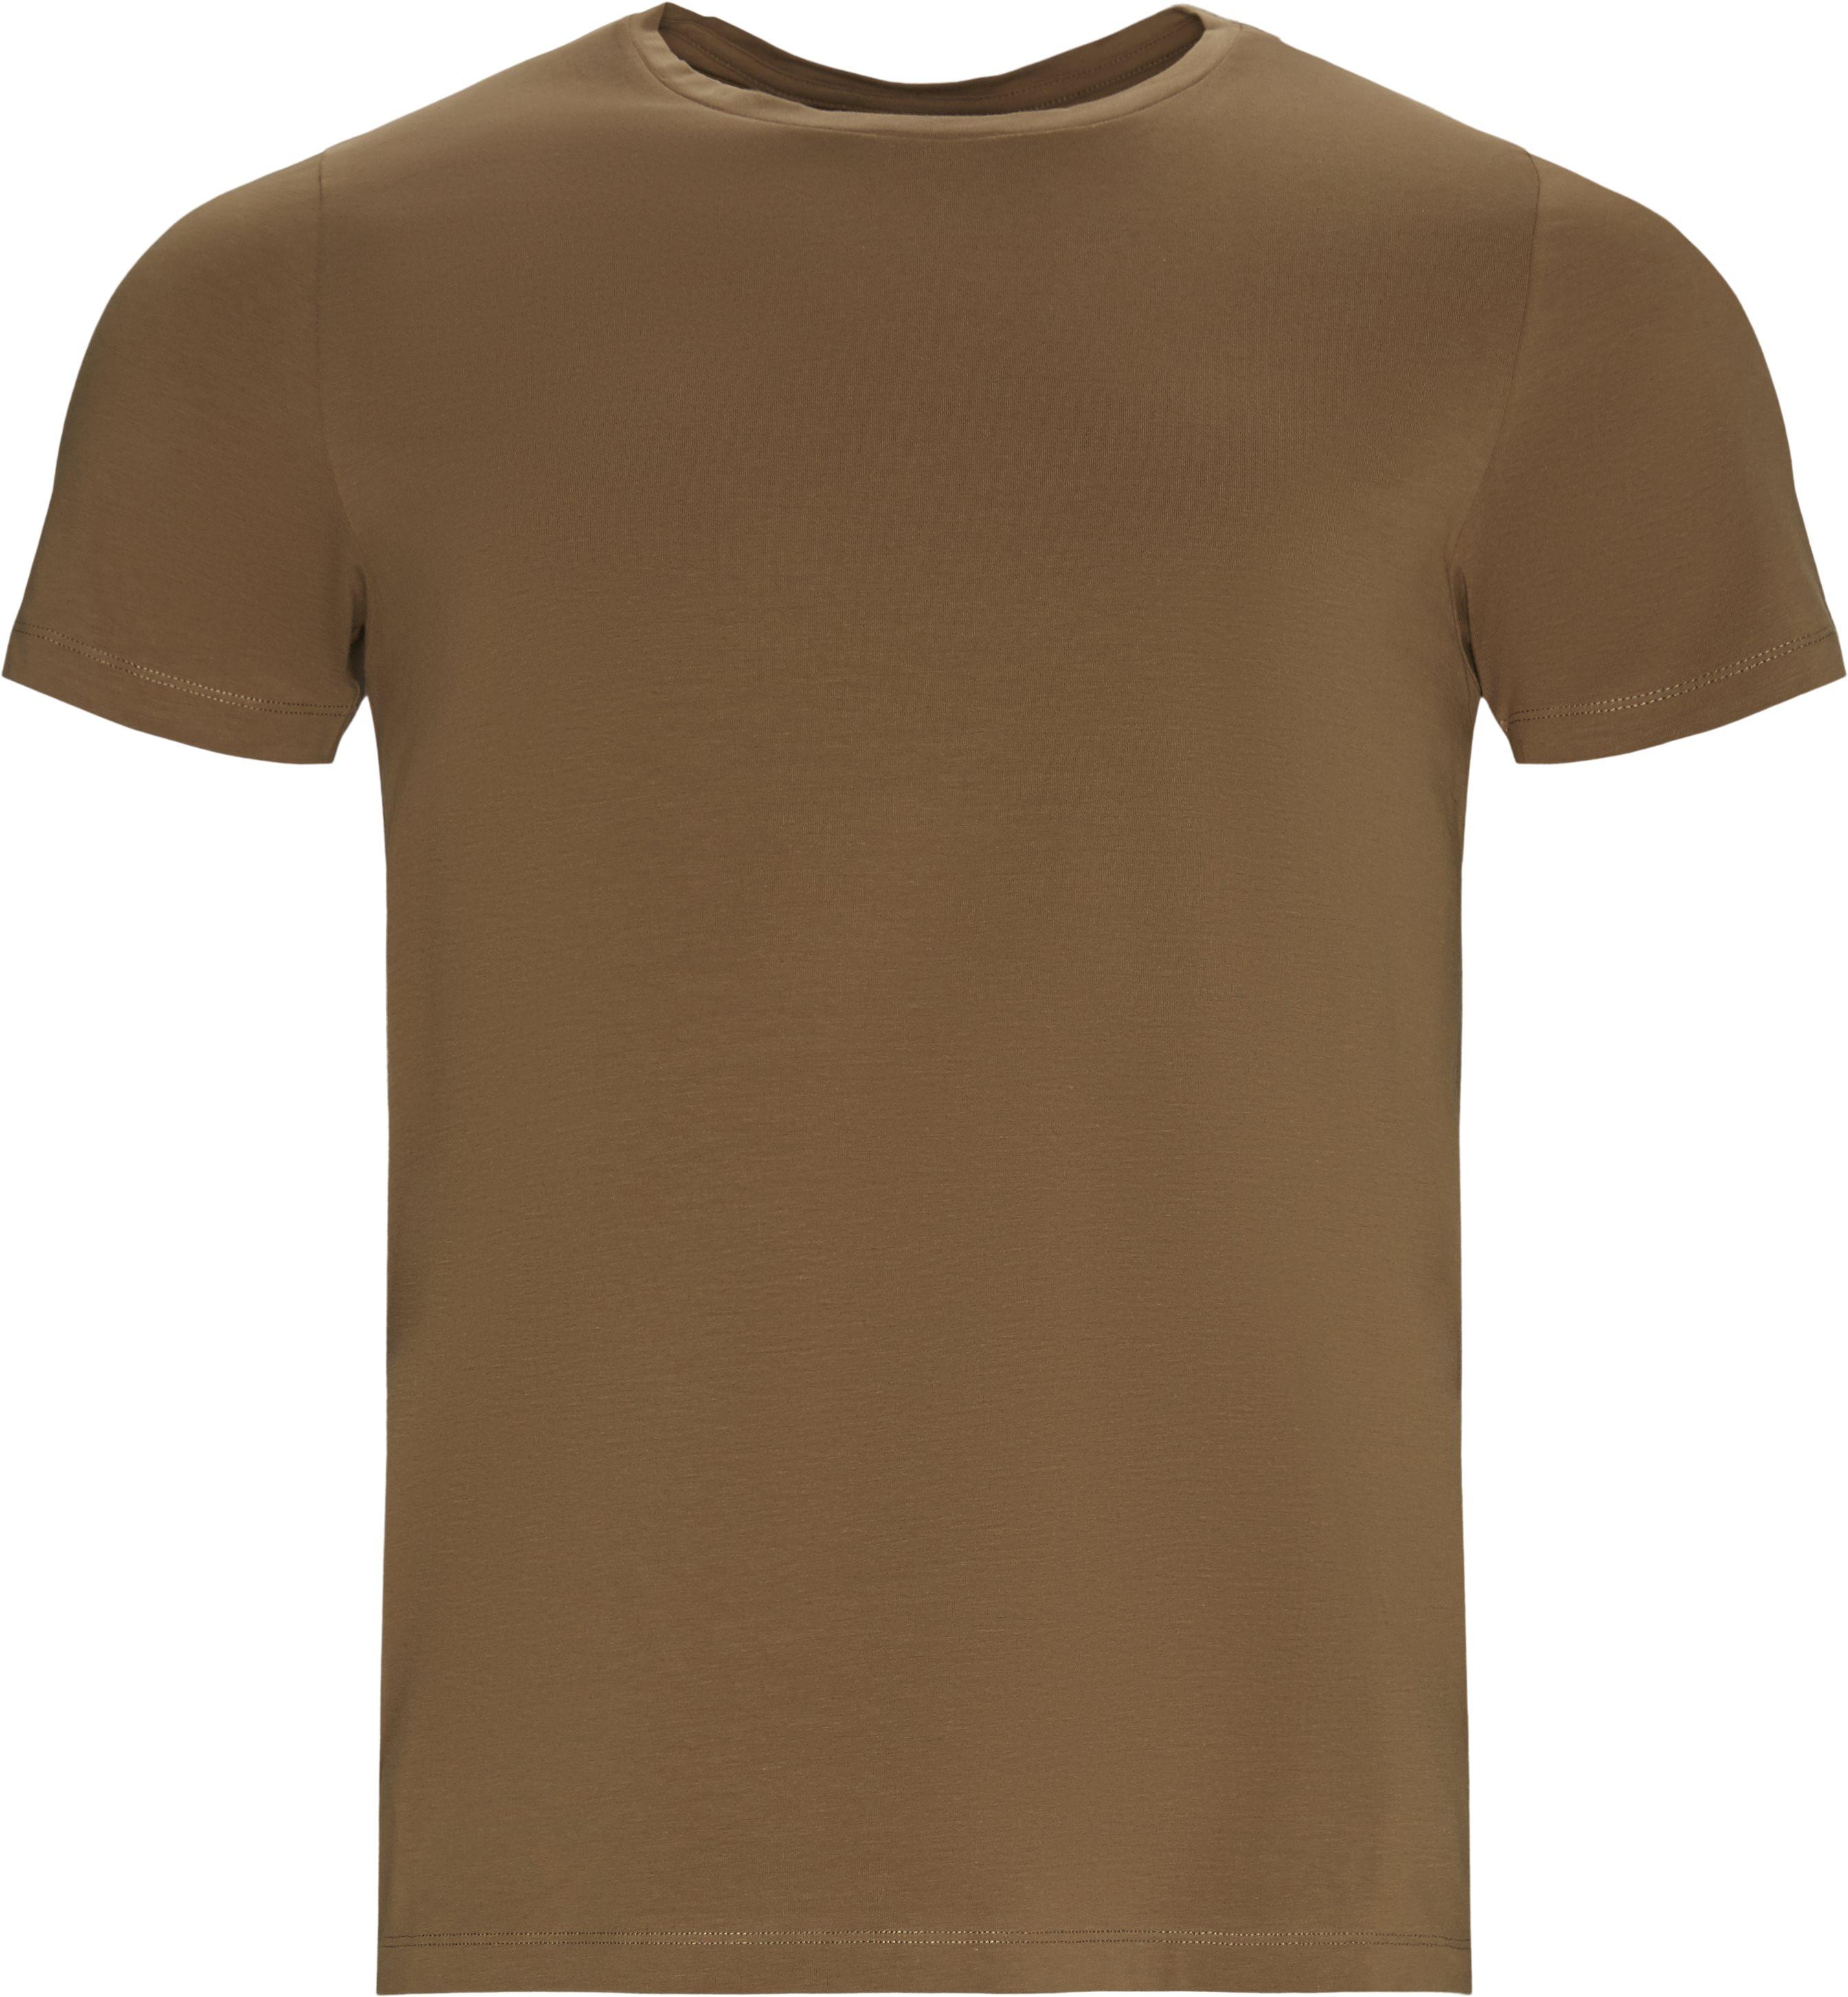 T-shirts - Regular fit - Brown